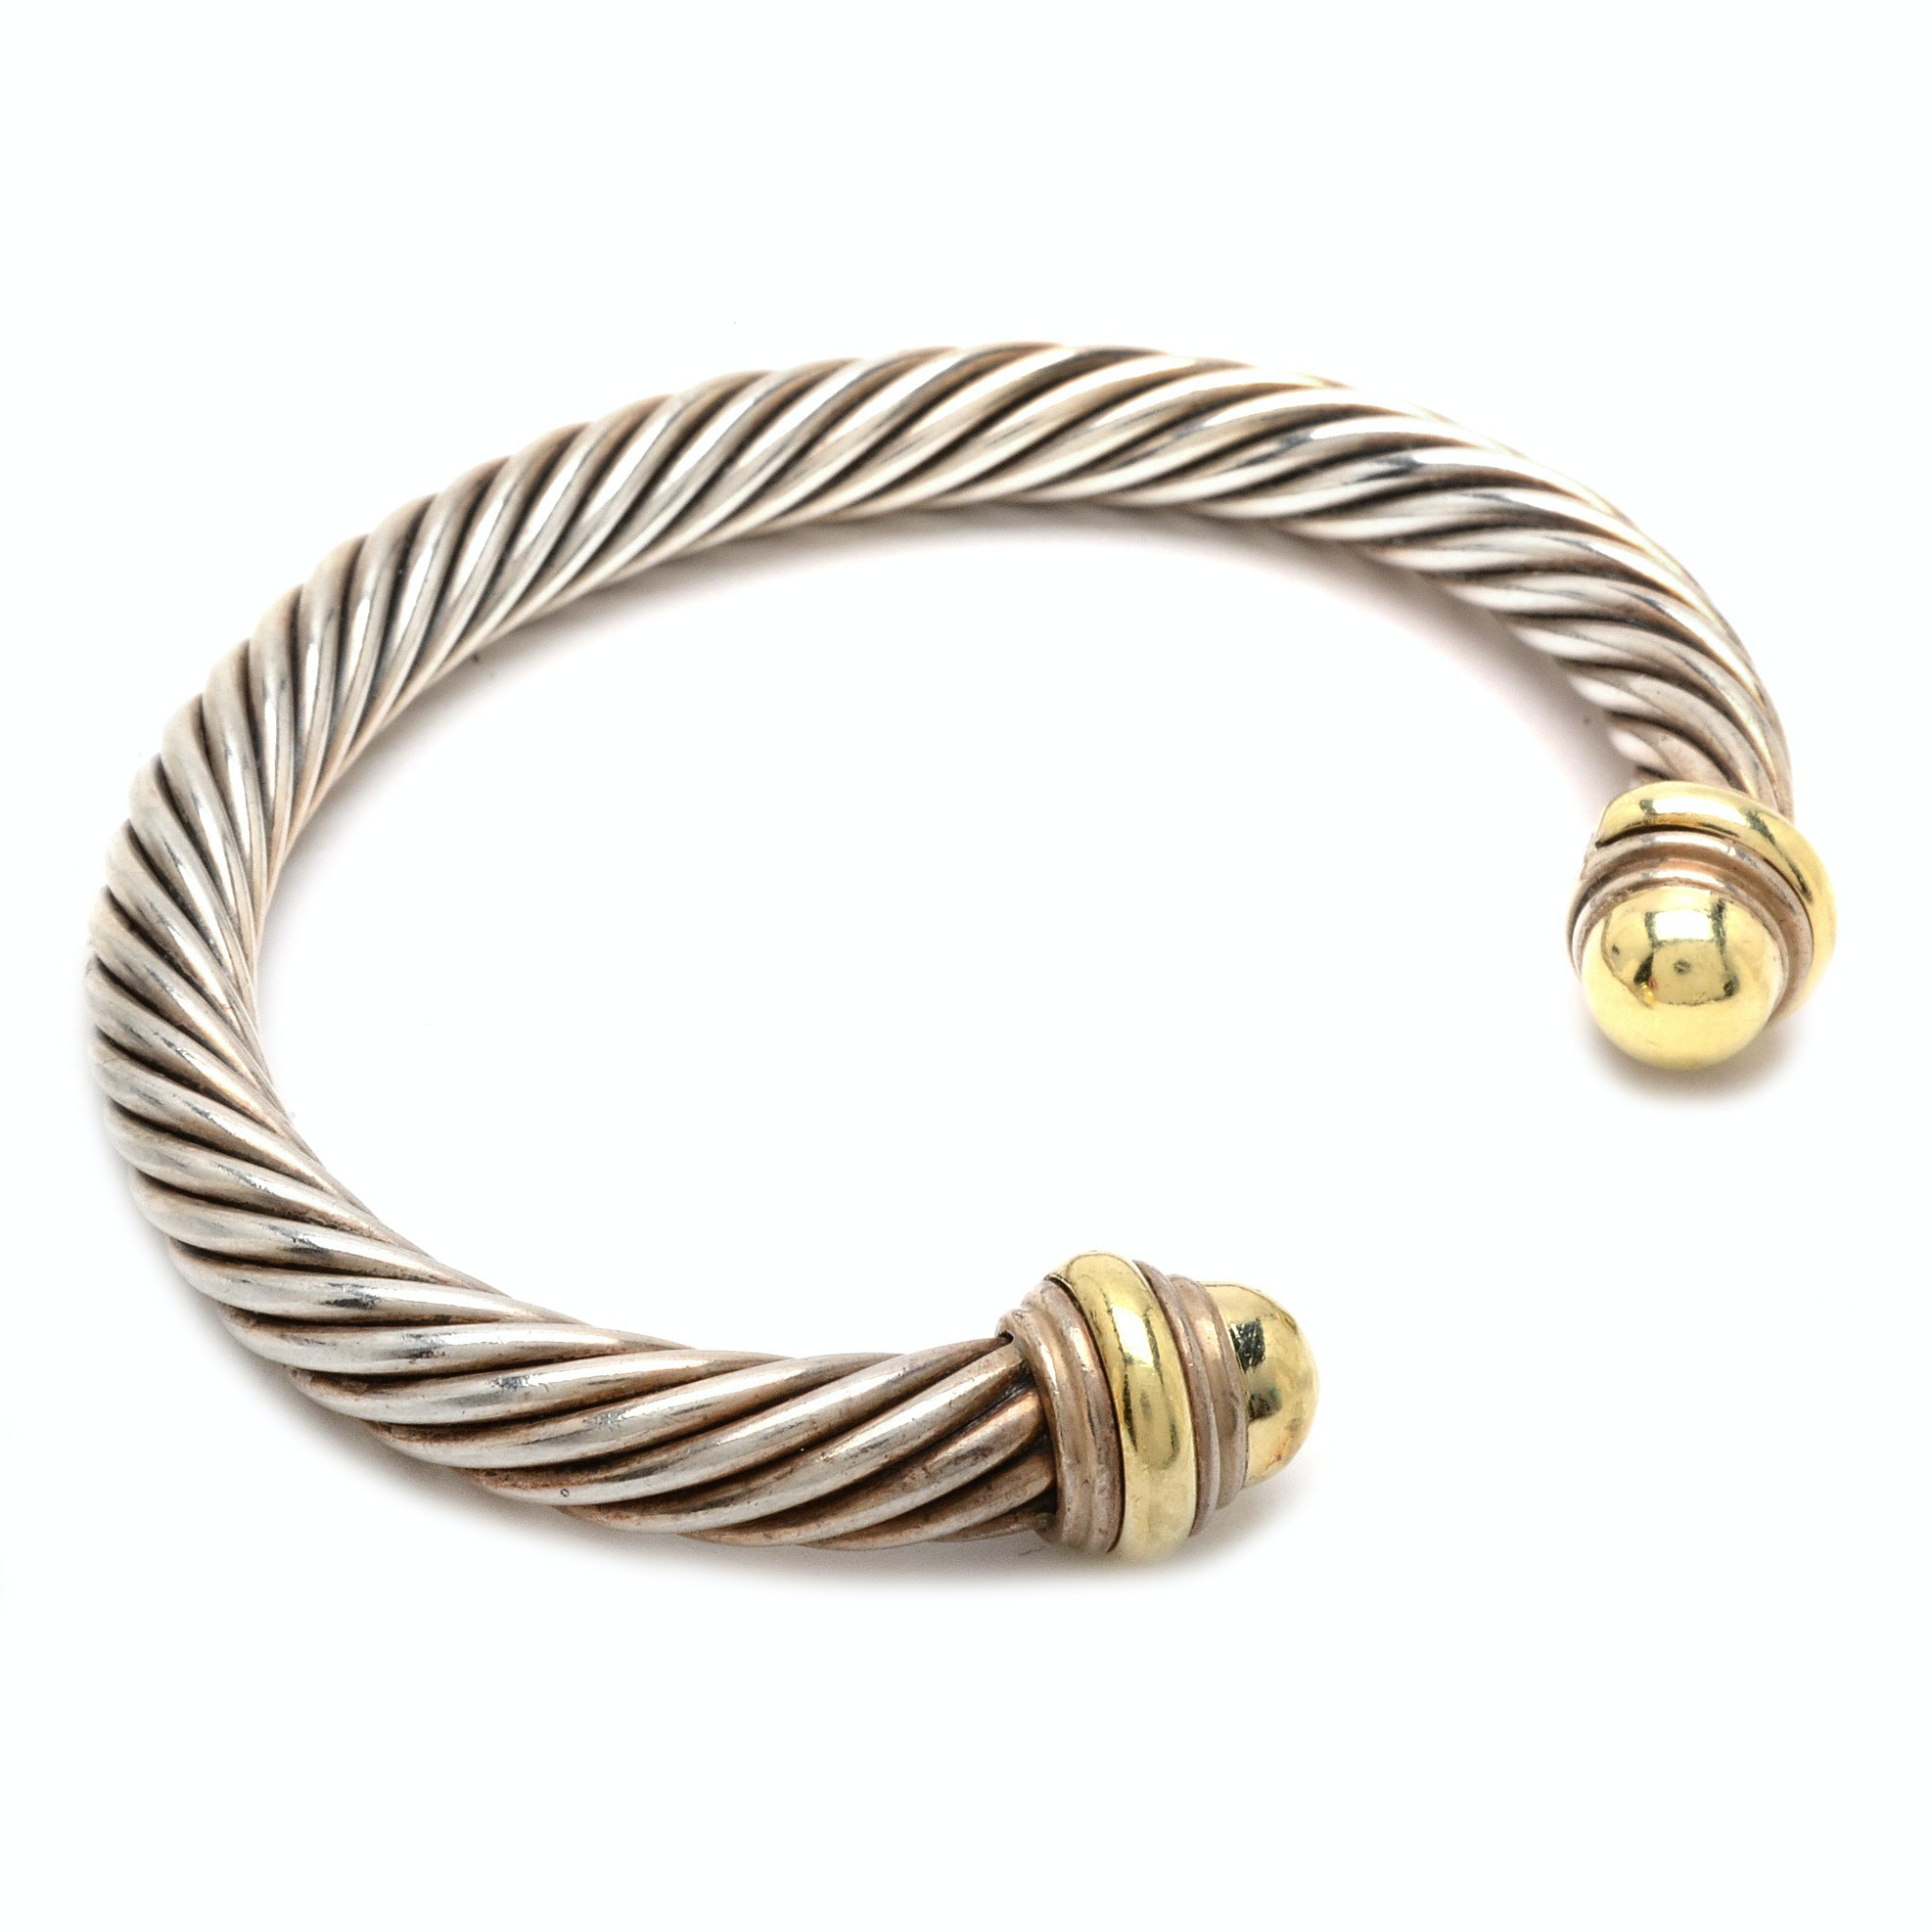 David Yurman Sterling Silver and 14K Yellow Gold Cuff Bracelet